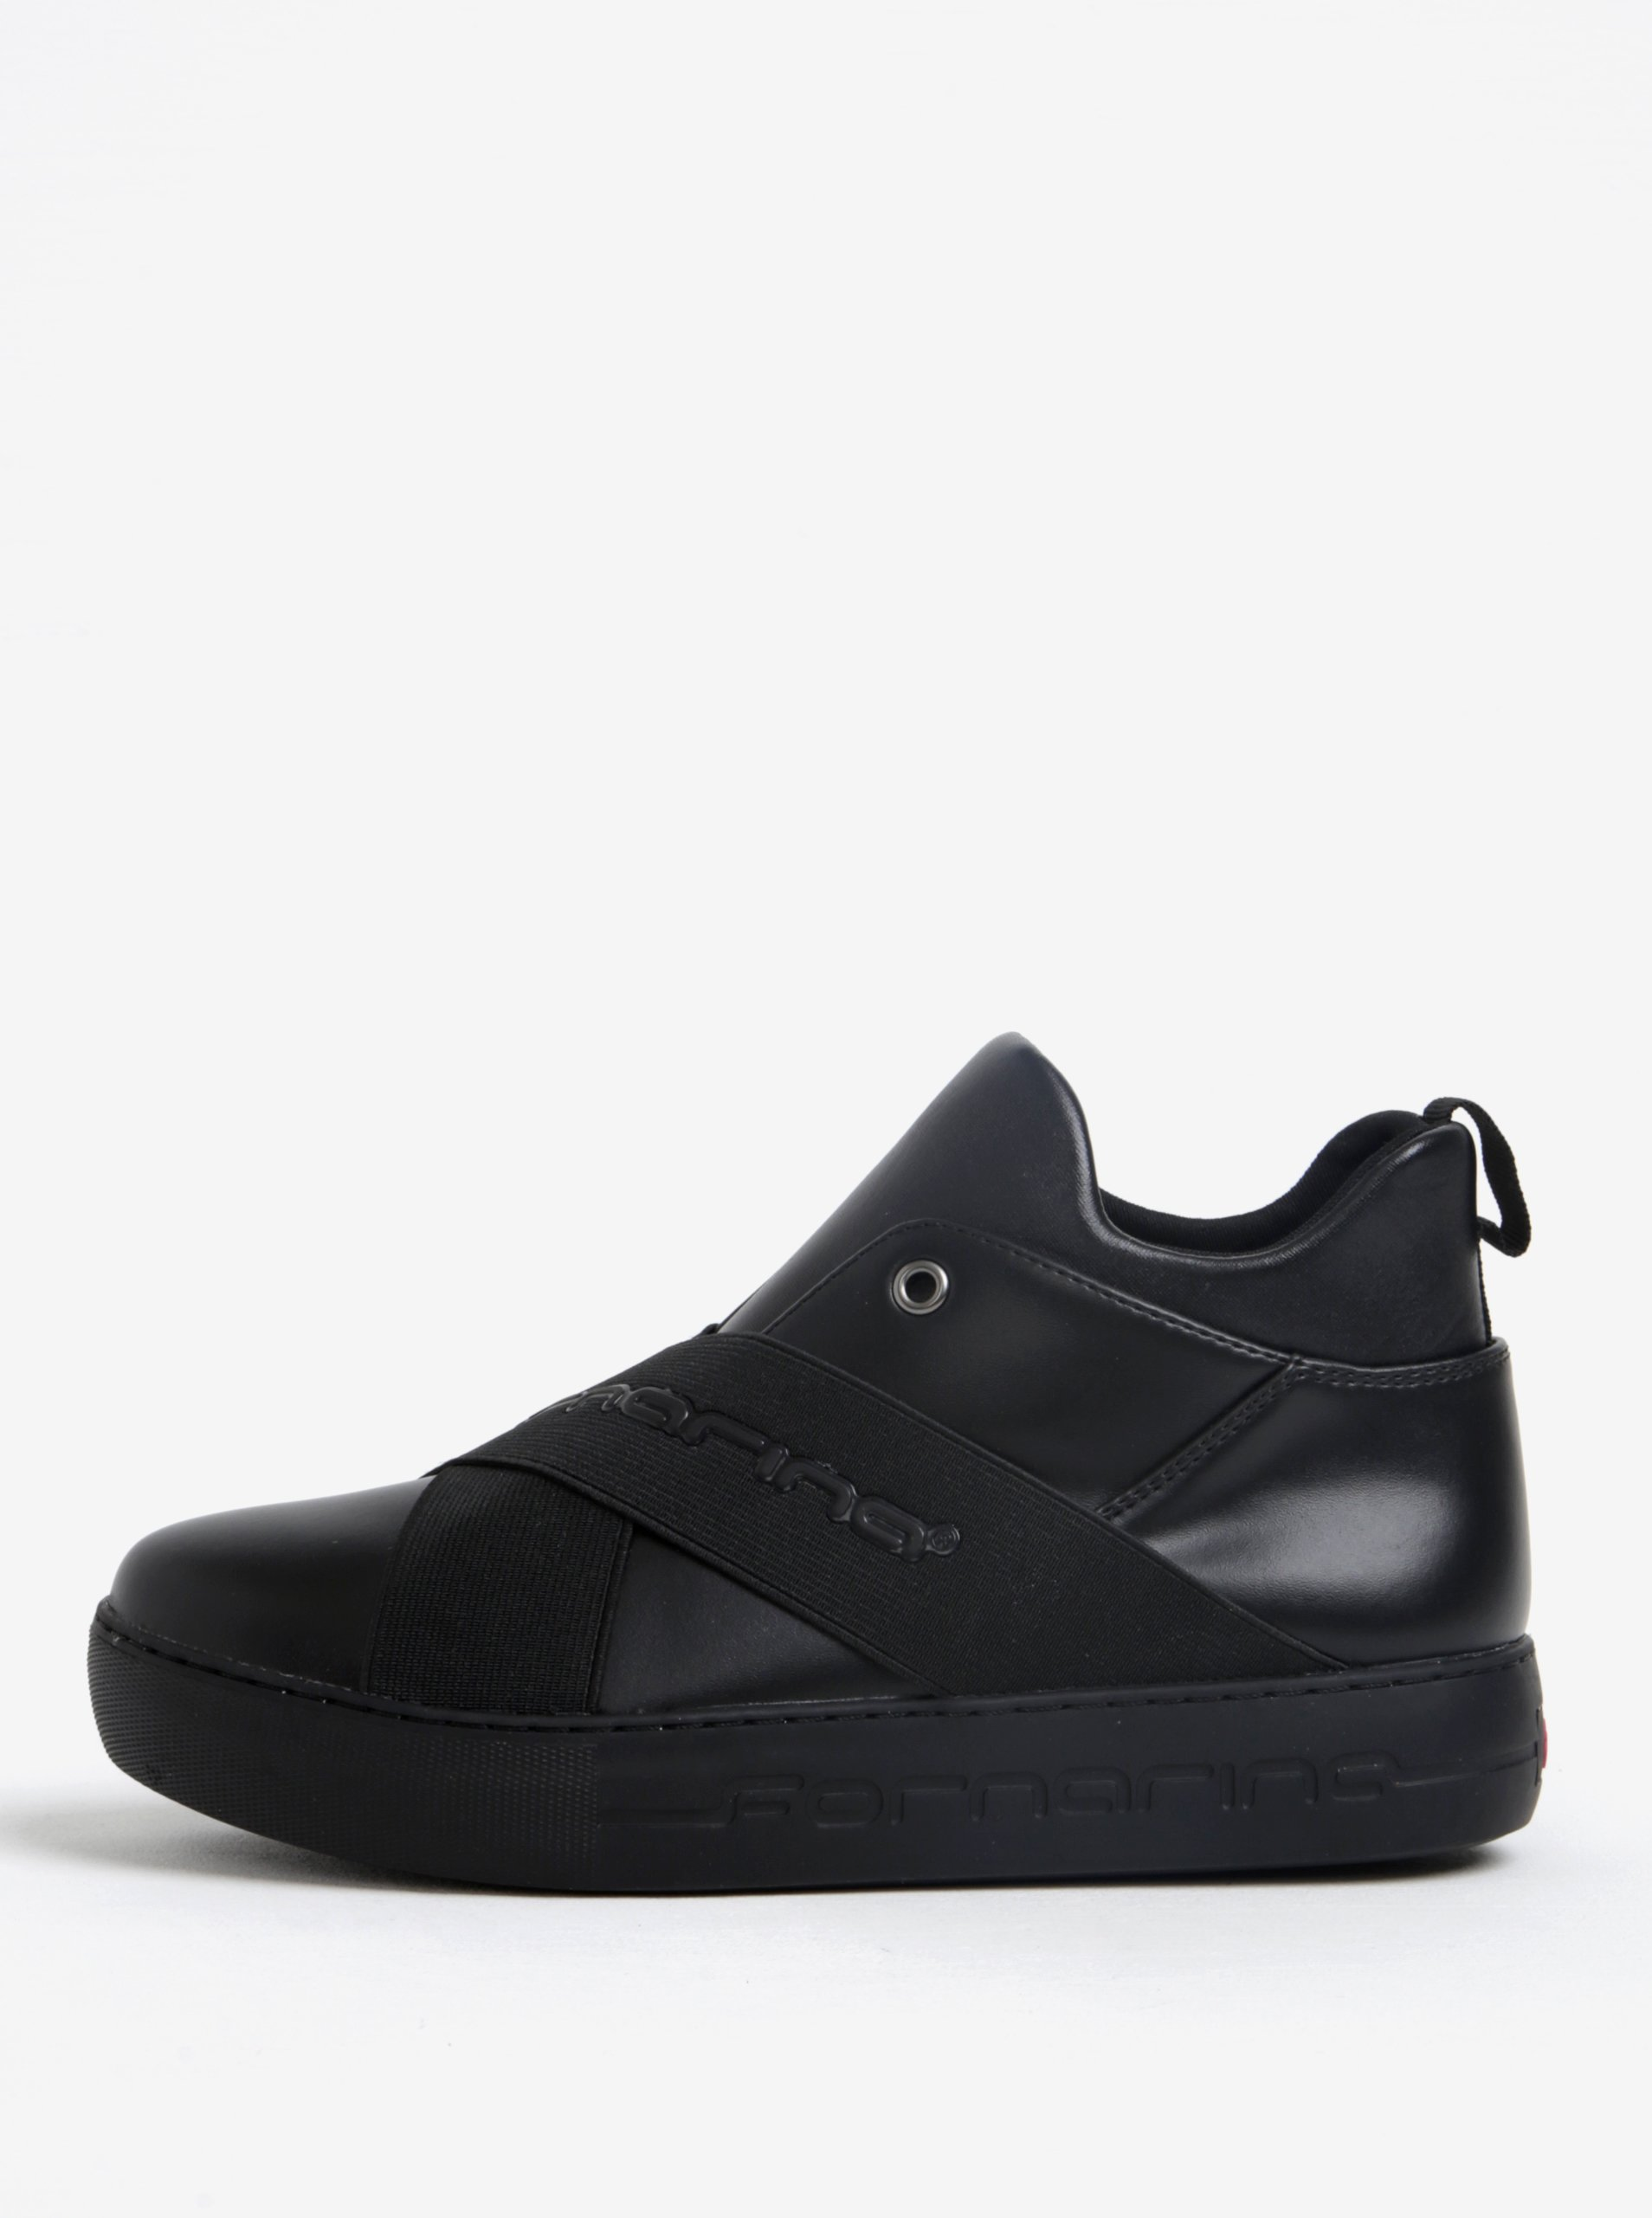 Černé kožené kotníkové boty na platformě Fornarina Yuma